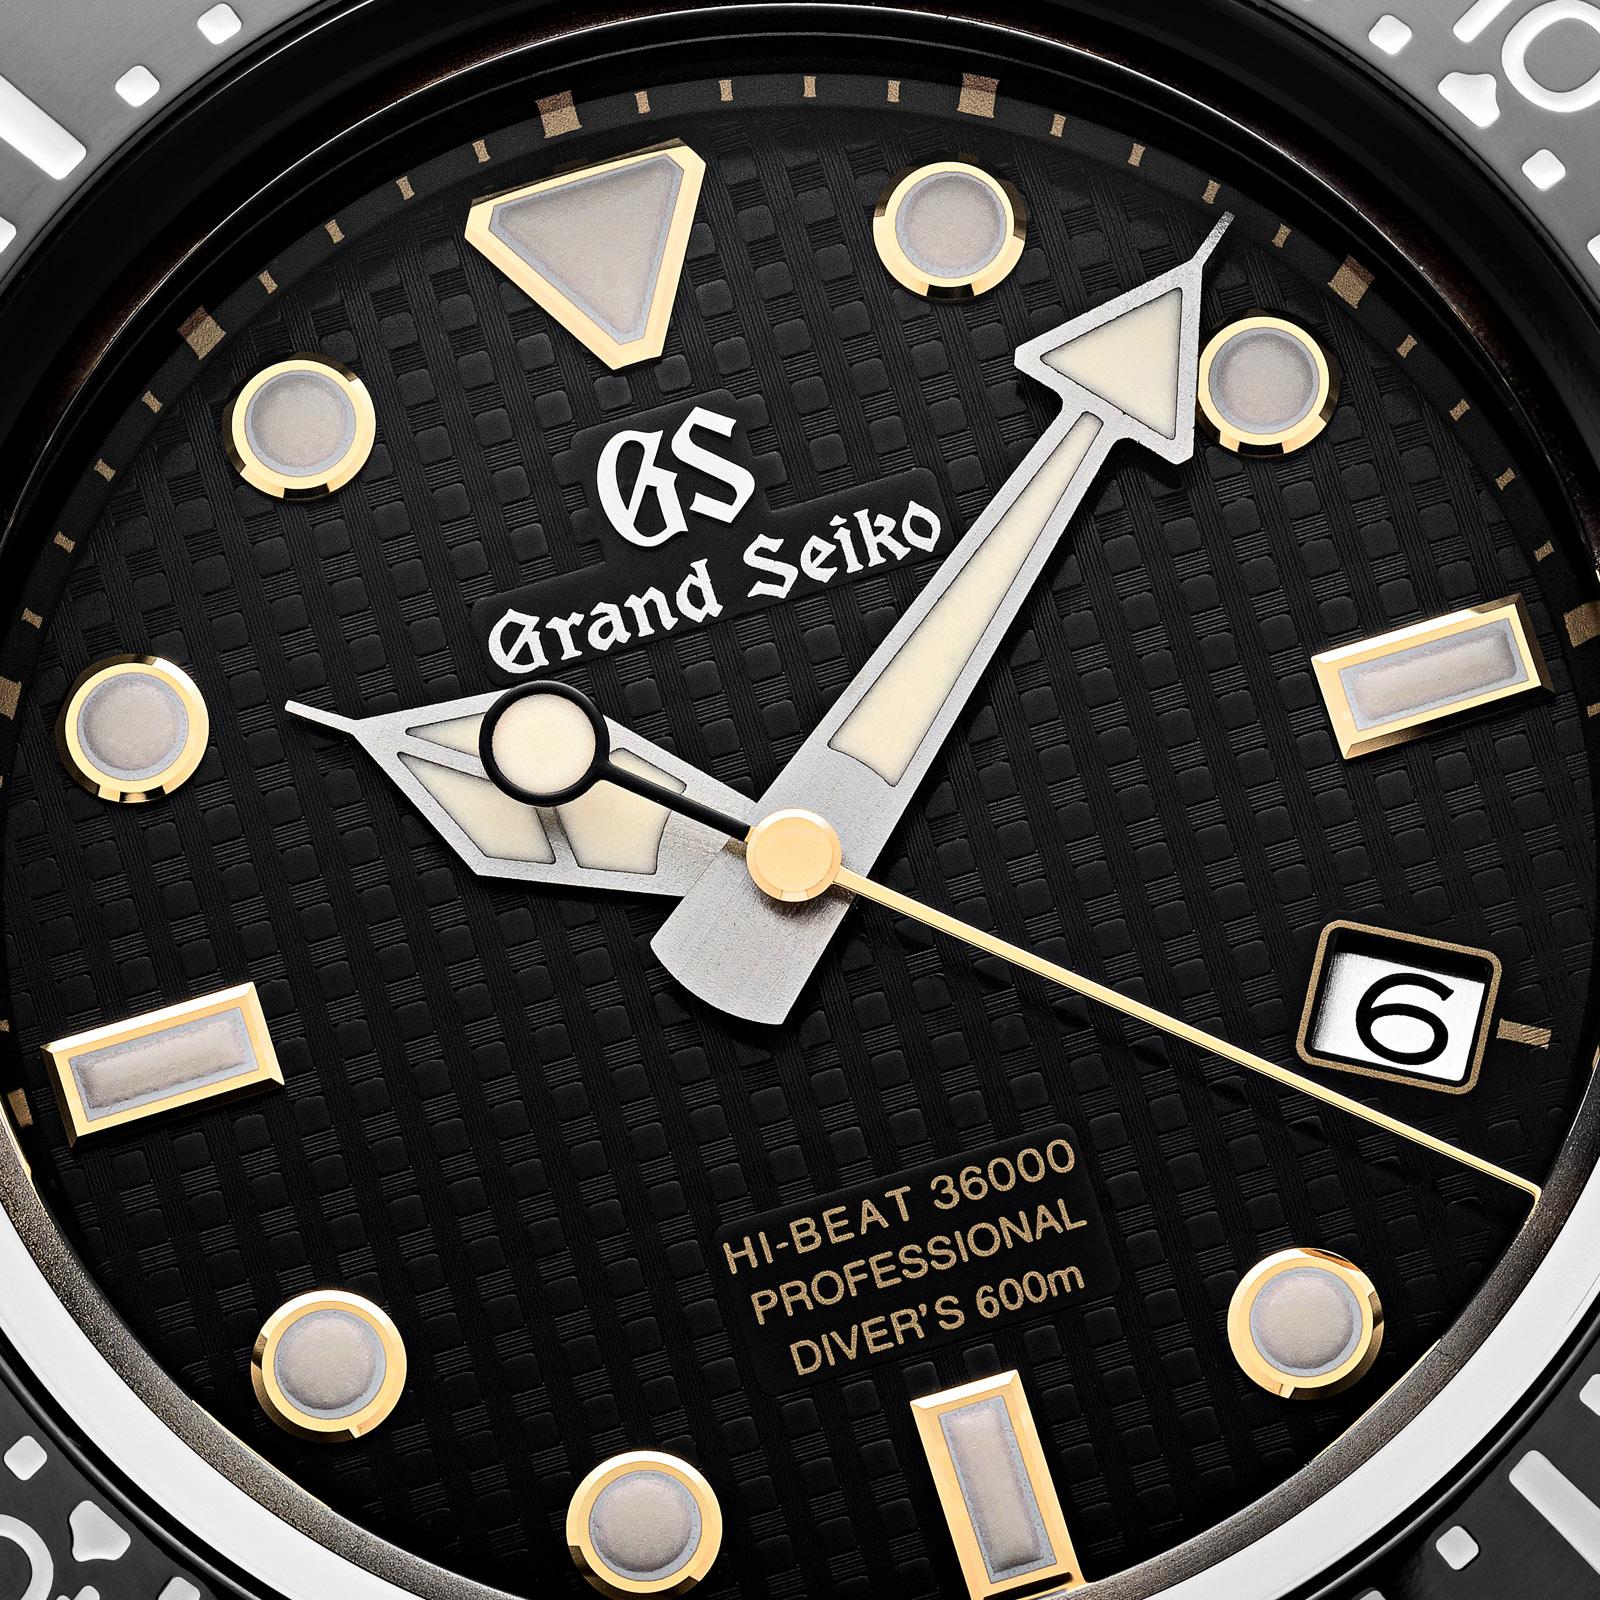 Grand Seiko SBGH255 - macro detail of the black textured dial.